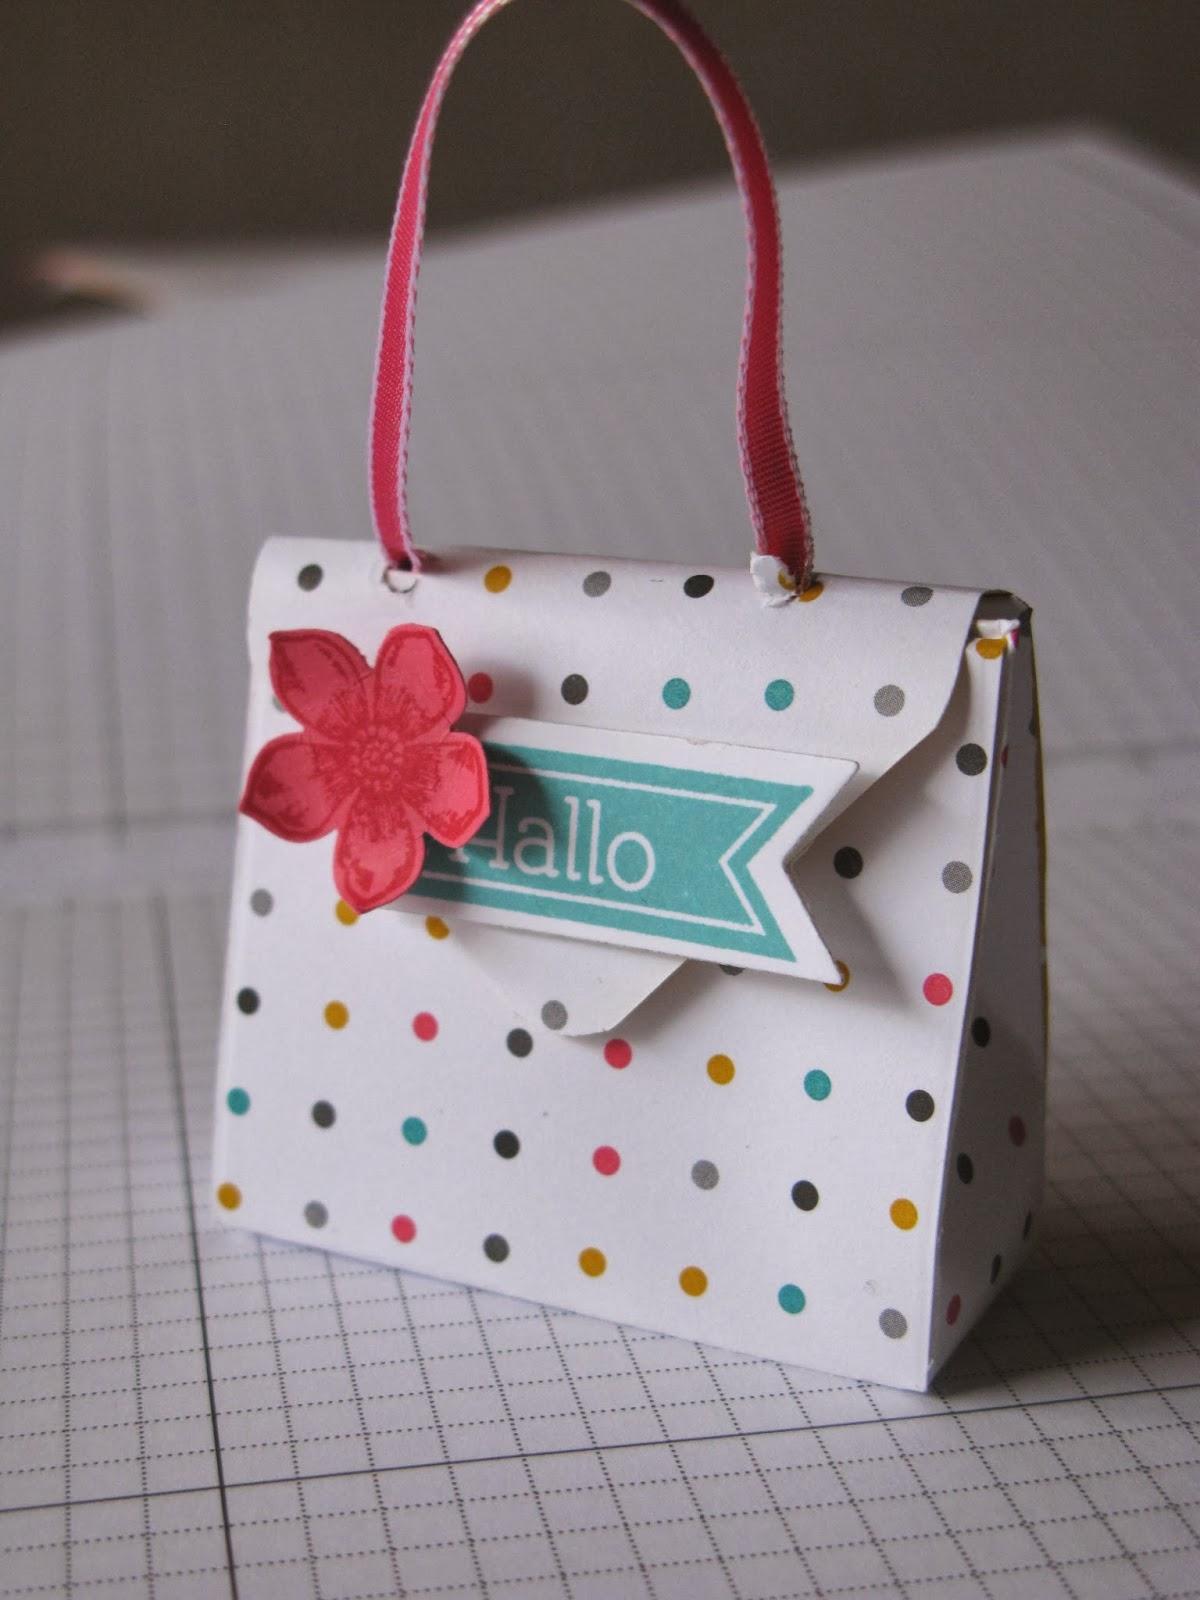 stampin mit scraproomboom kleine handtaschen mit envelope punch board. Black Bedroom Furniture Sets. Home Design Ideas